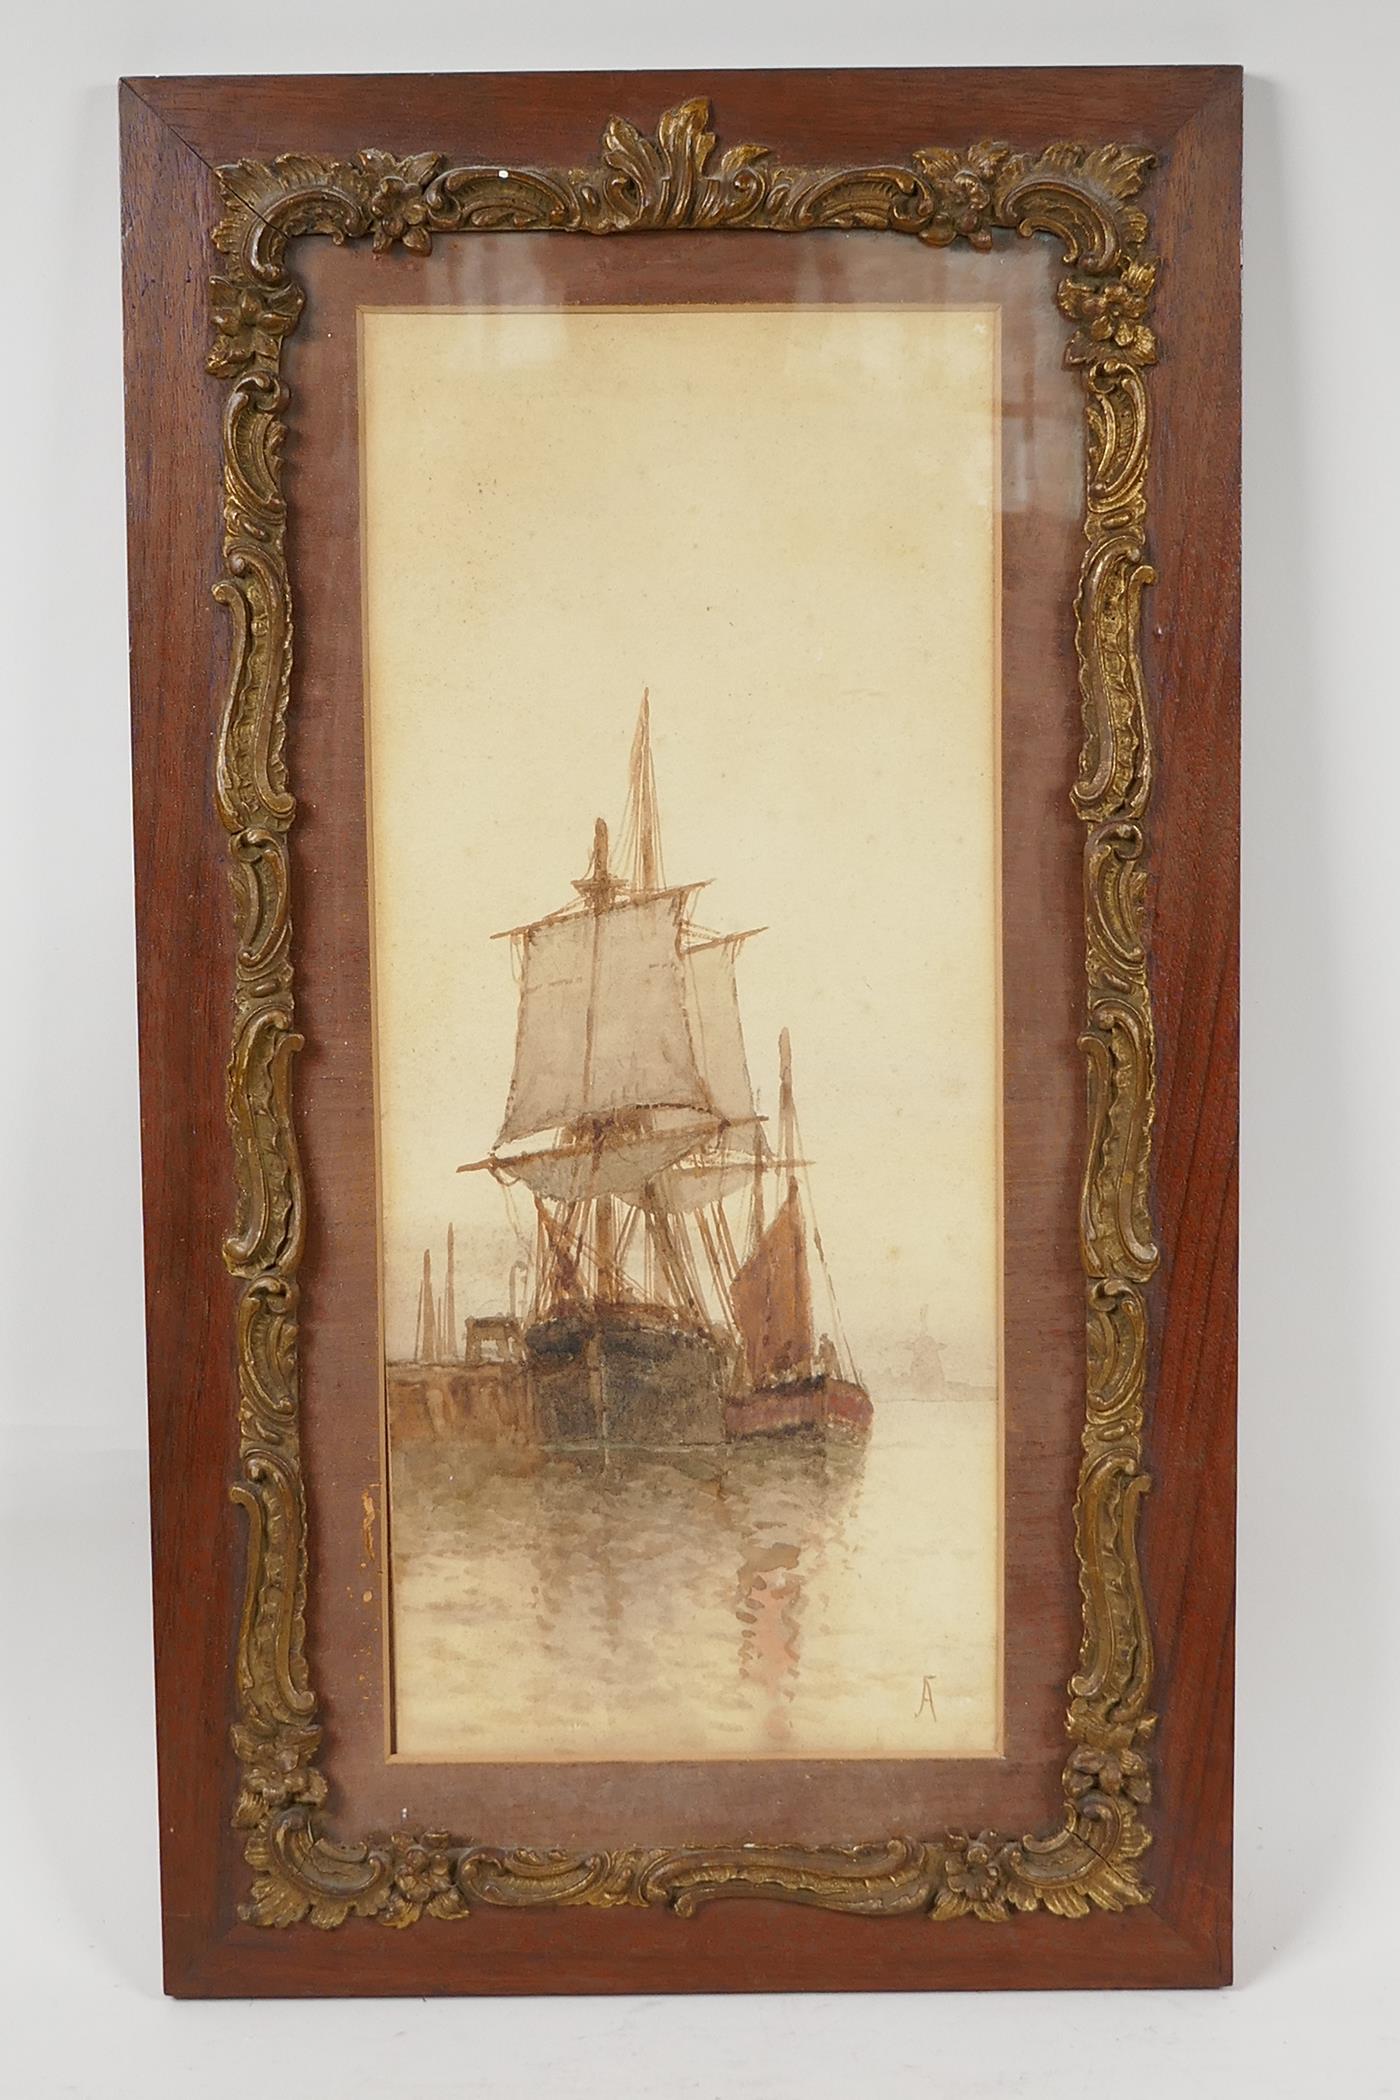 "F.J. Aldridge, sailing vessels near a jetty, monogrammed, watercolour, 14"" x 6"" - Image 2 of 4"